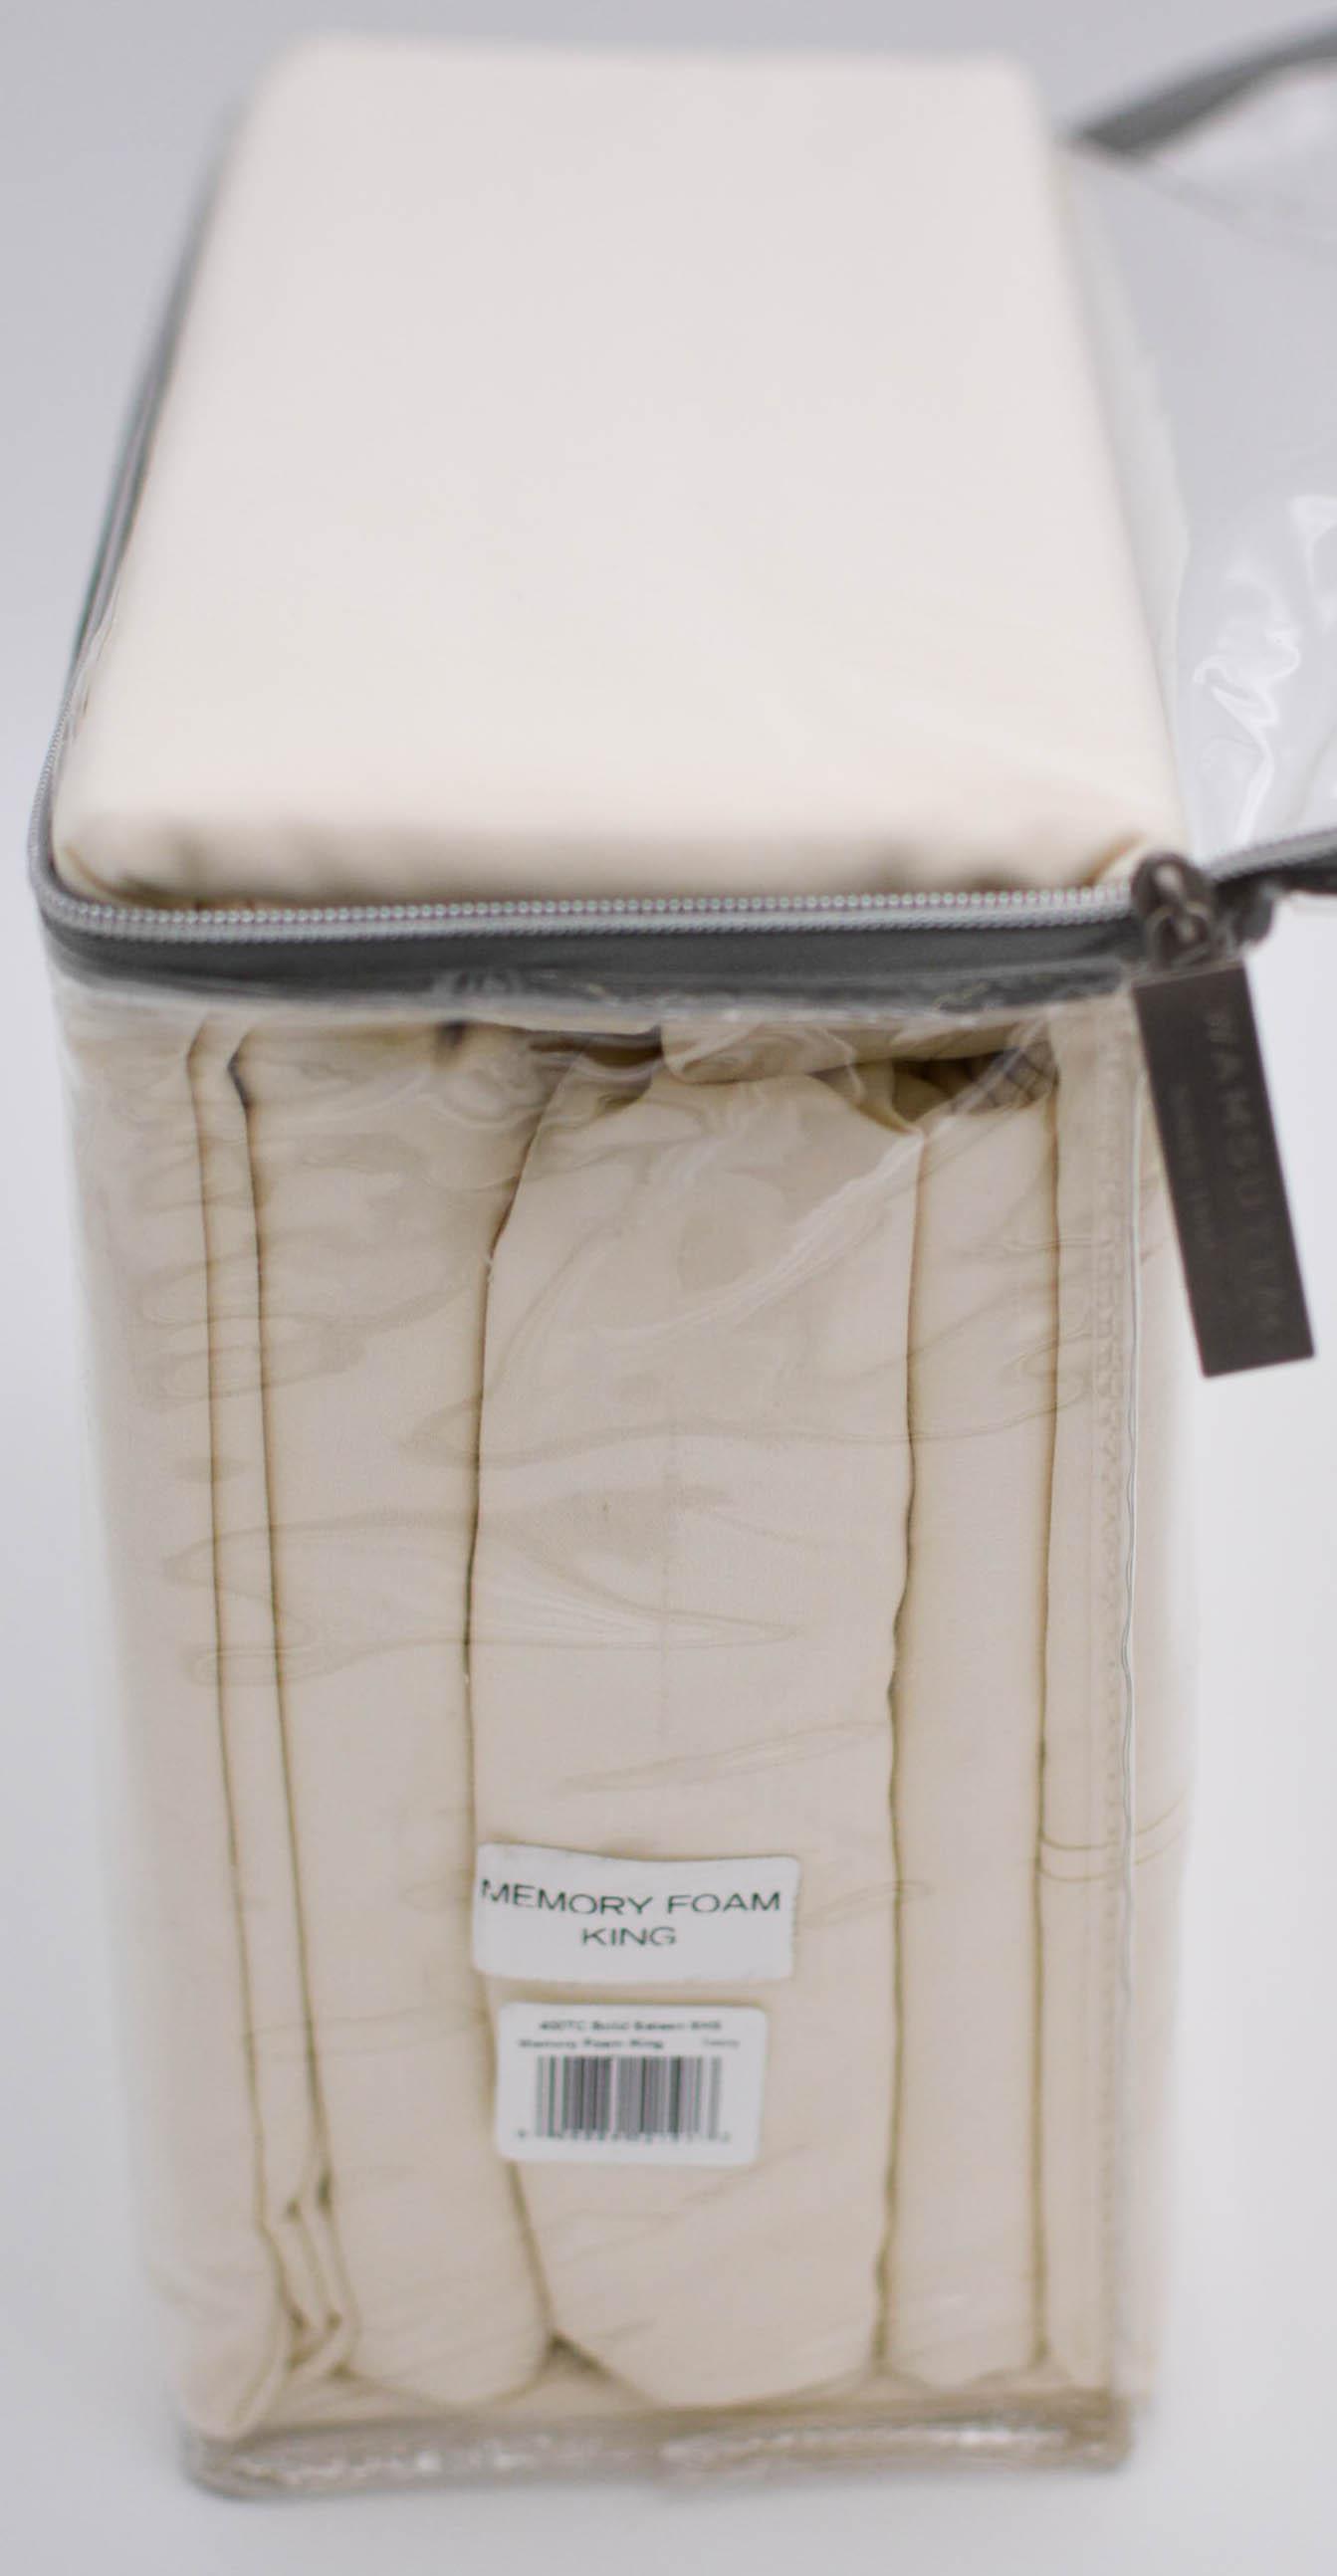 Wamsutta-Memory-Foam-400-Thread-Count-Sheet-Set-Size-King-White-Ivory thumbnail 10